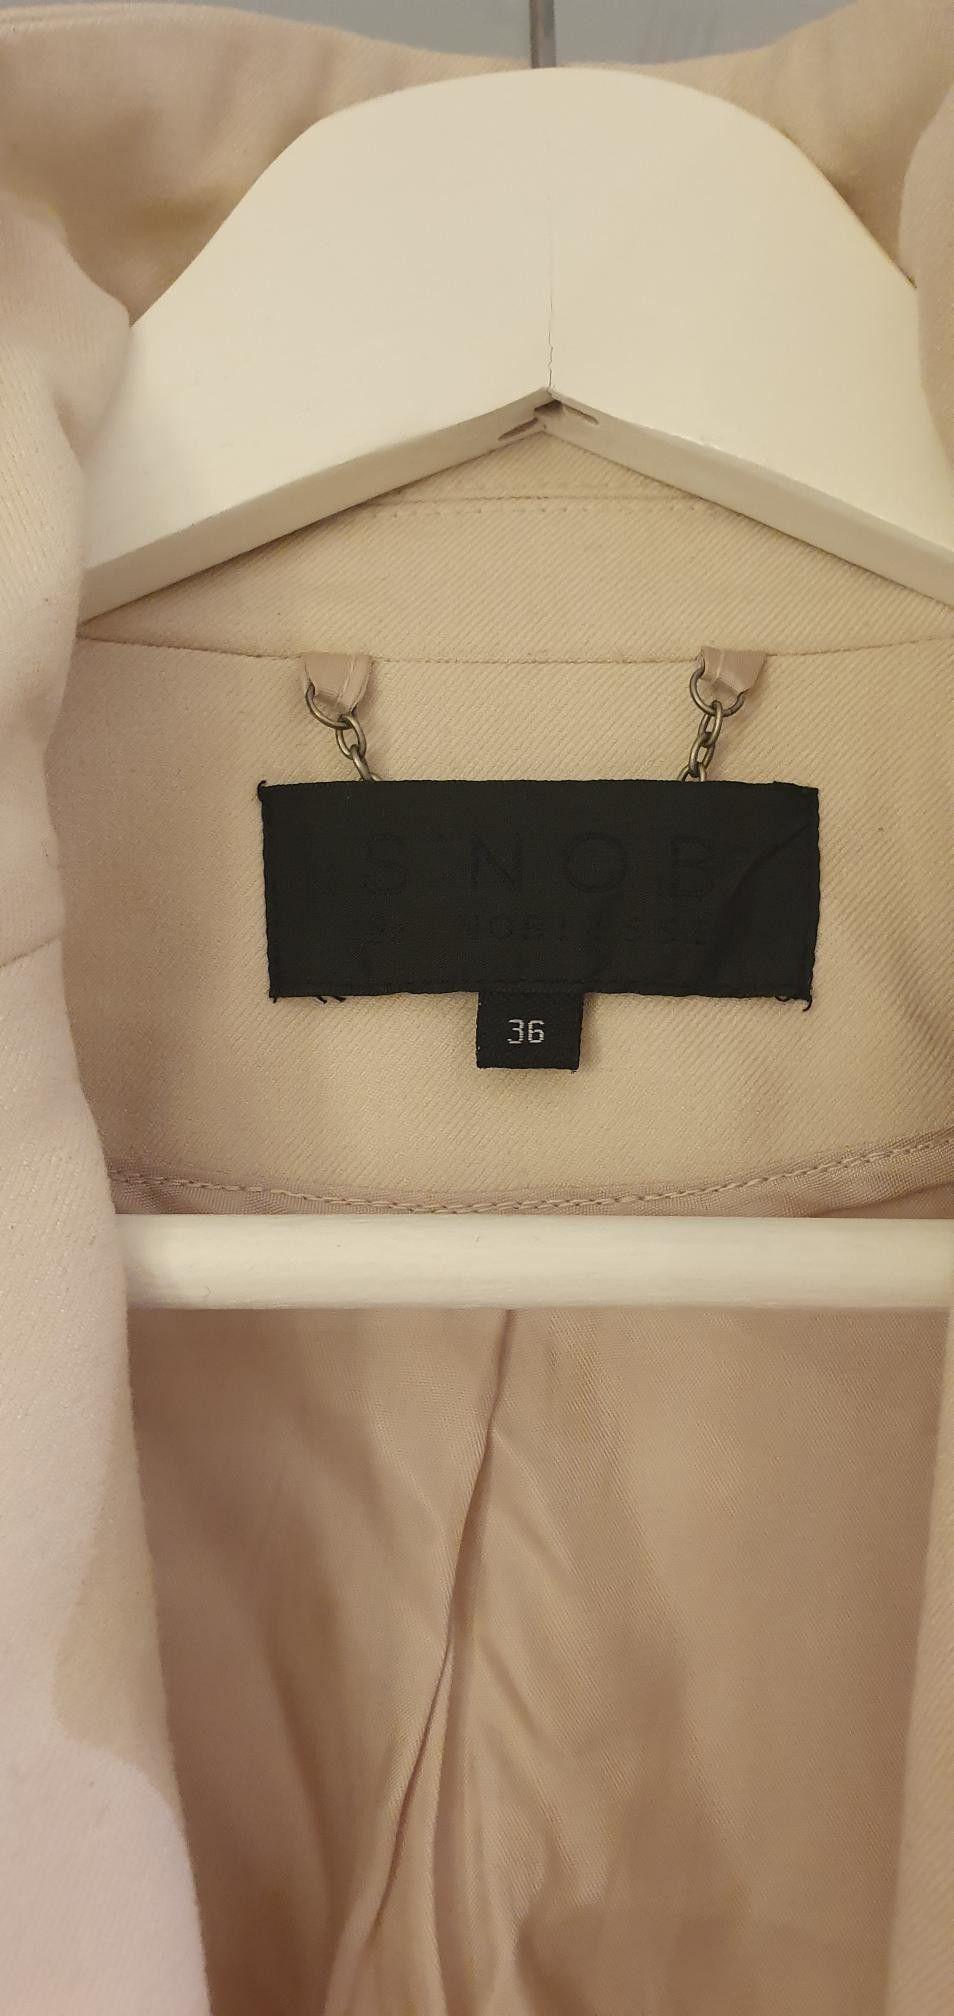 SNOB de Noblesse vest | FINN.no